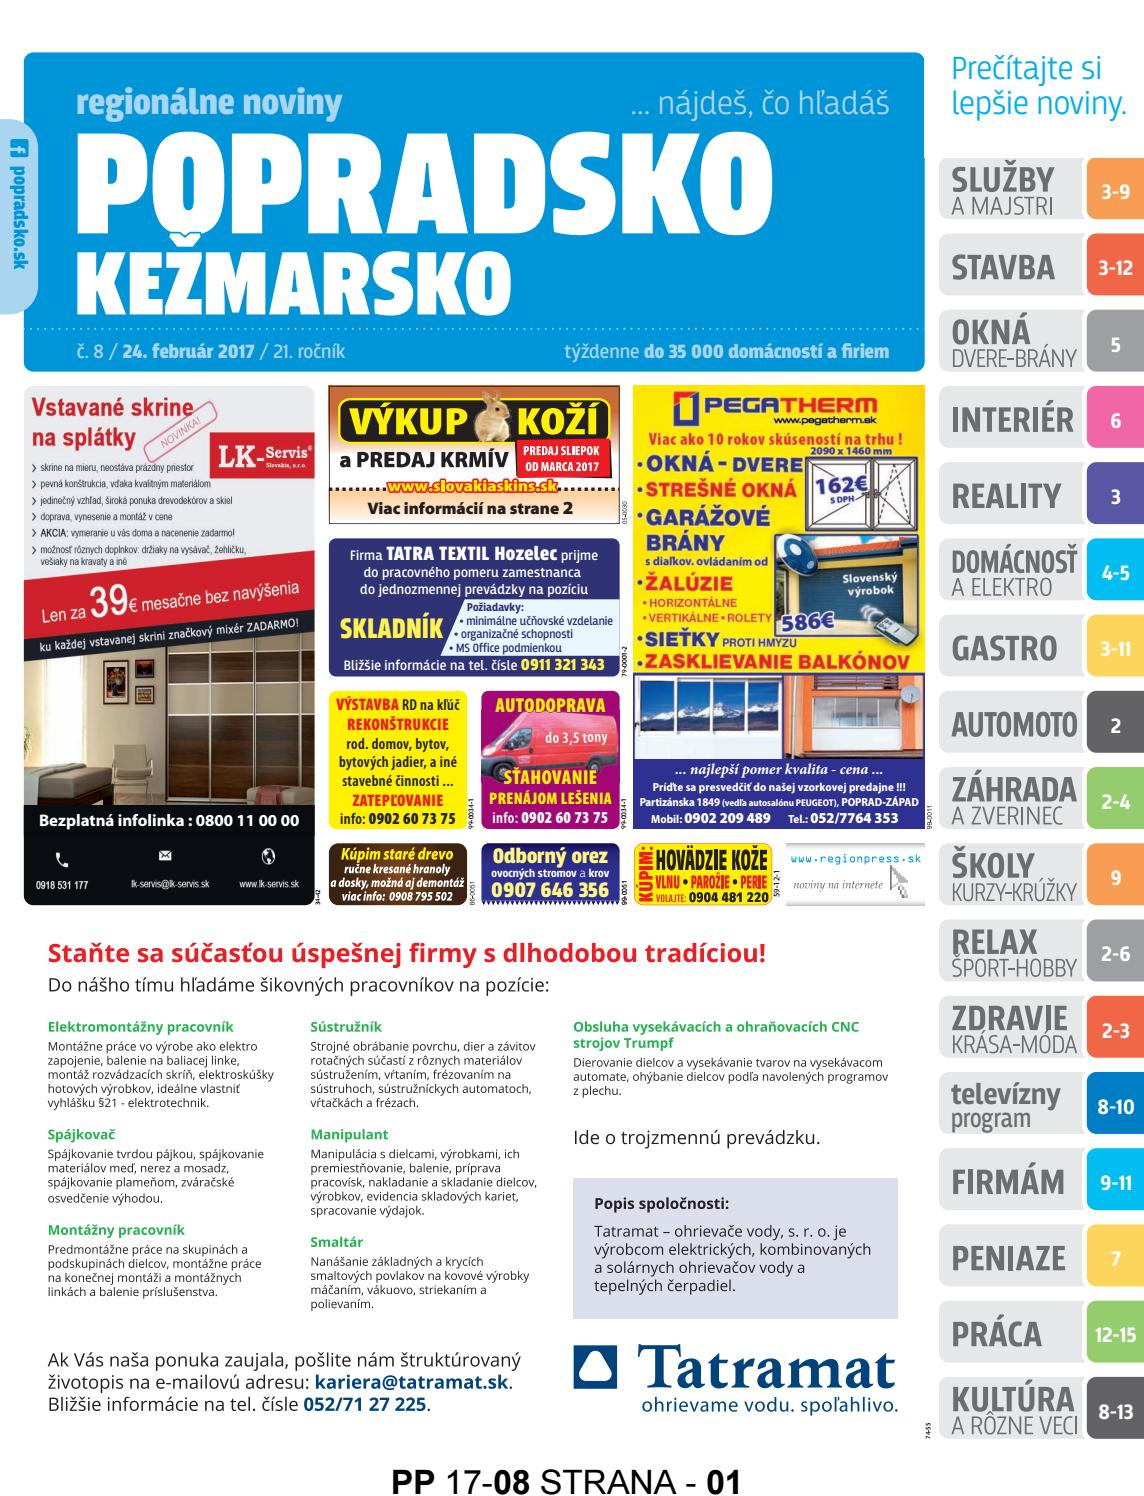 Inter Office Zoznamka politiky